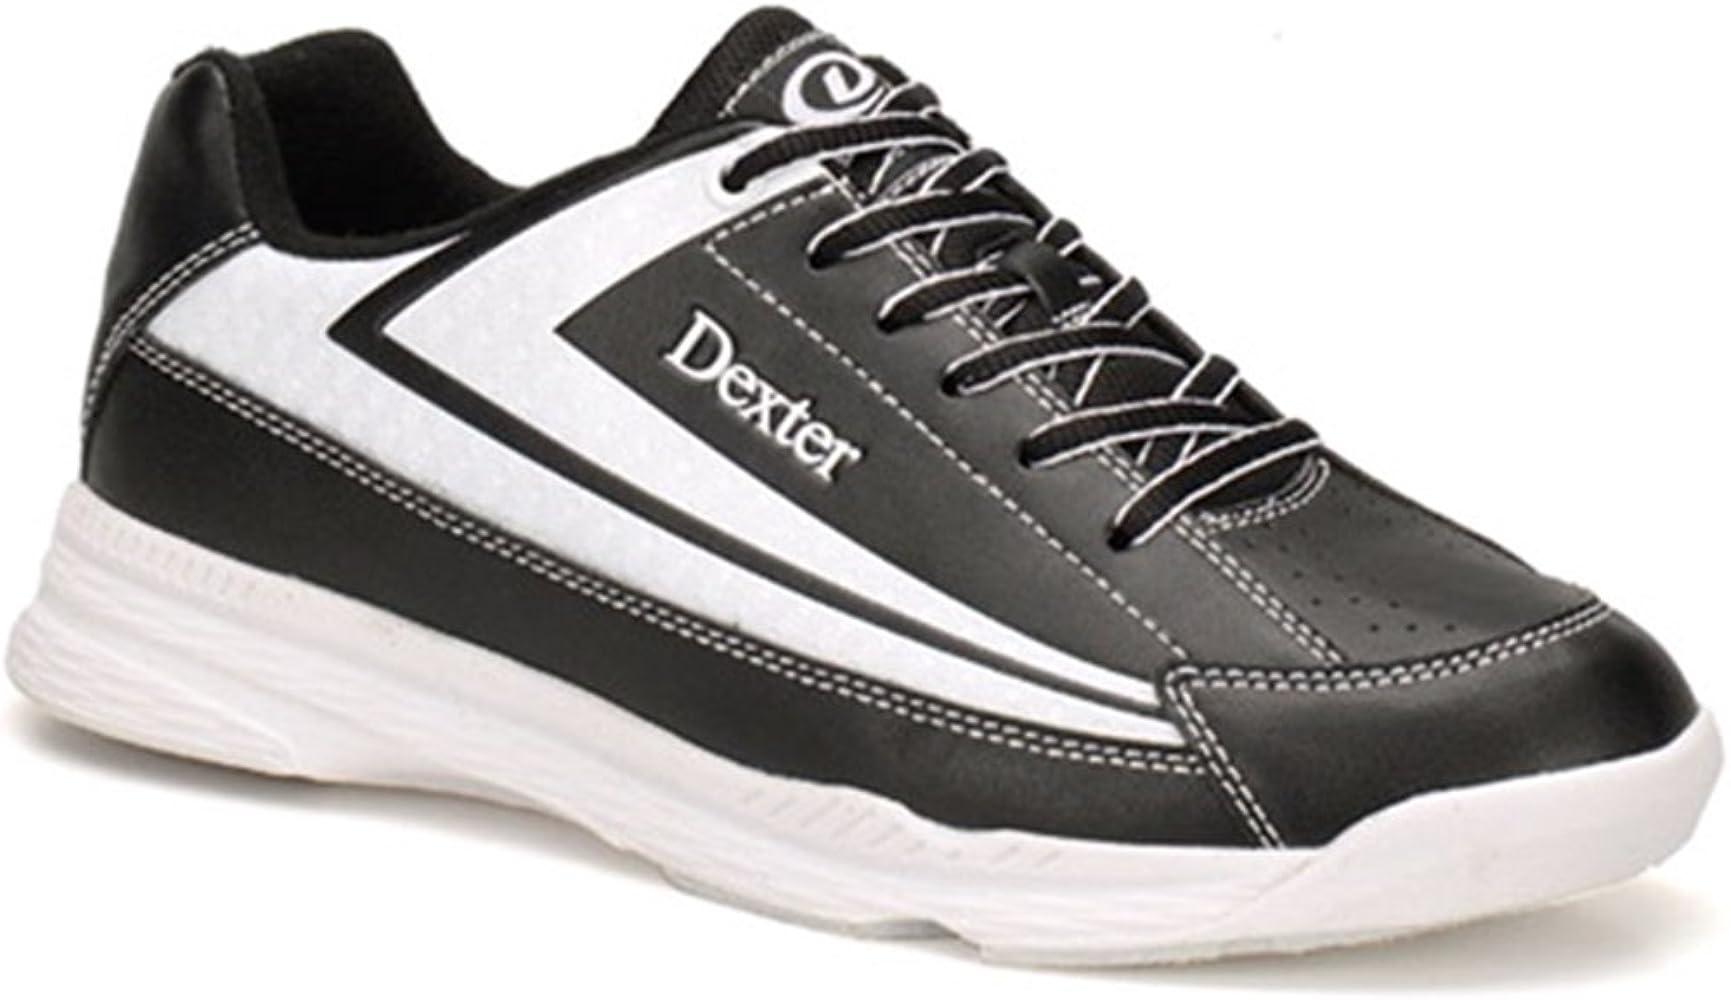 Amazon.com: Dexter Jack II Wide Bowling